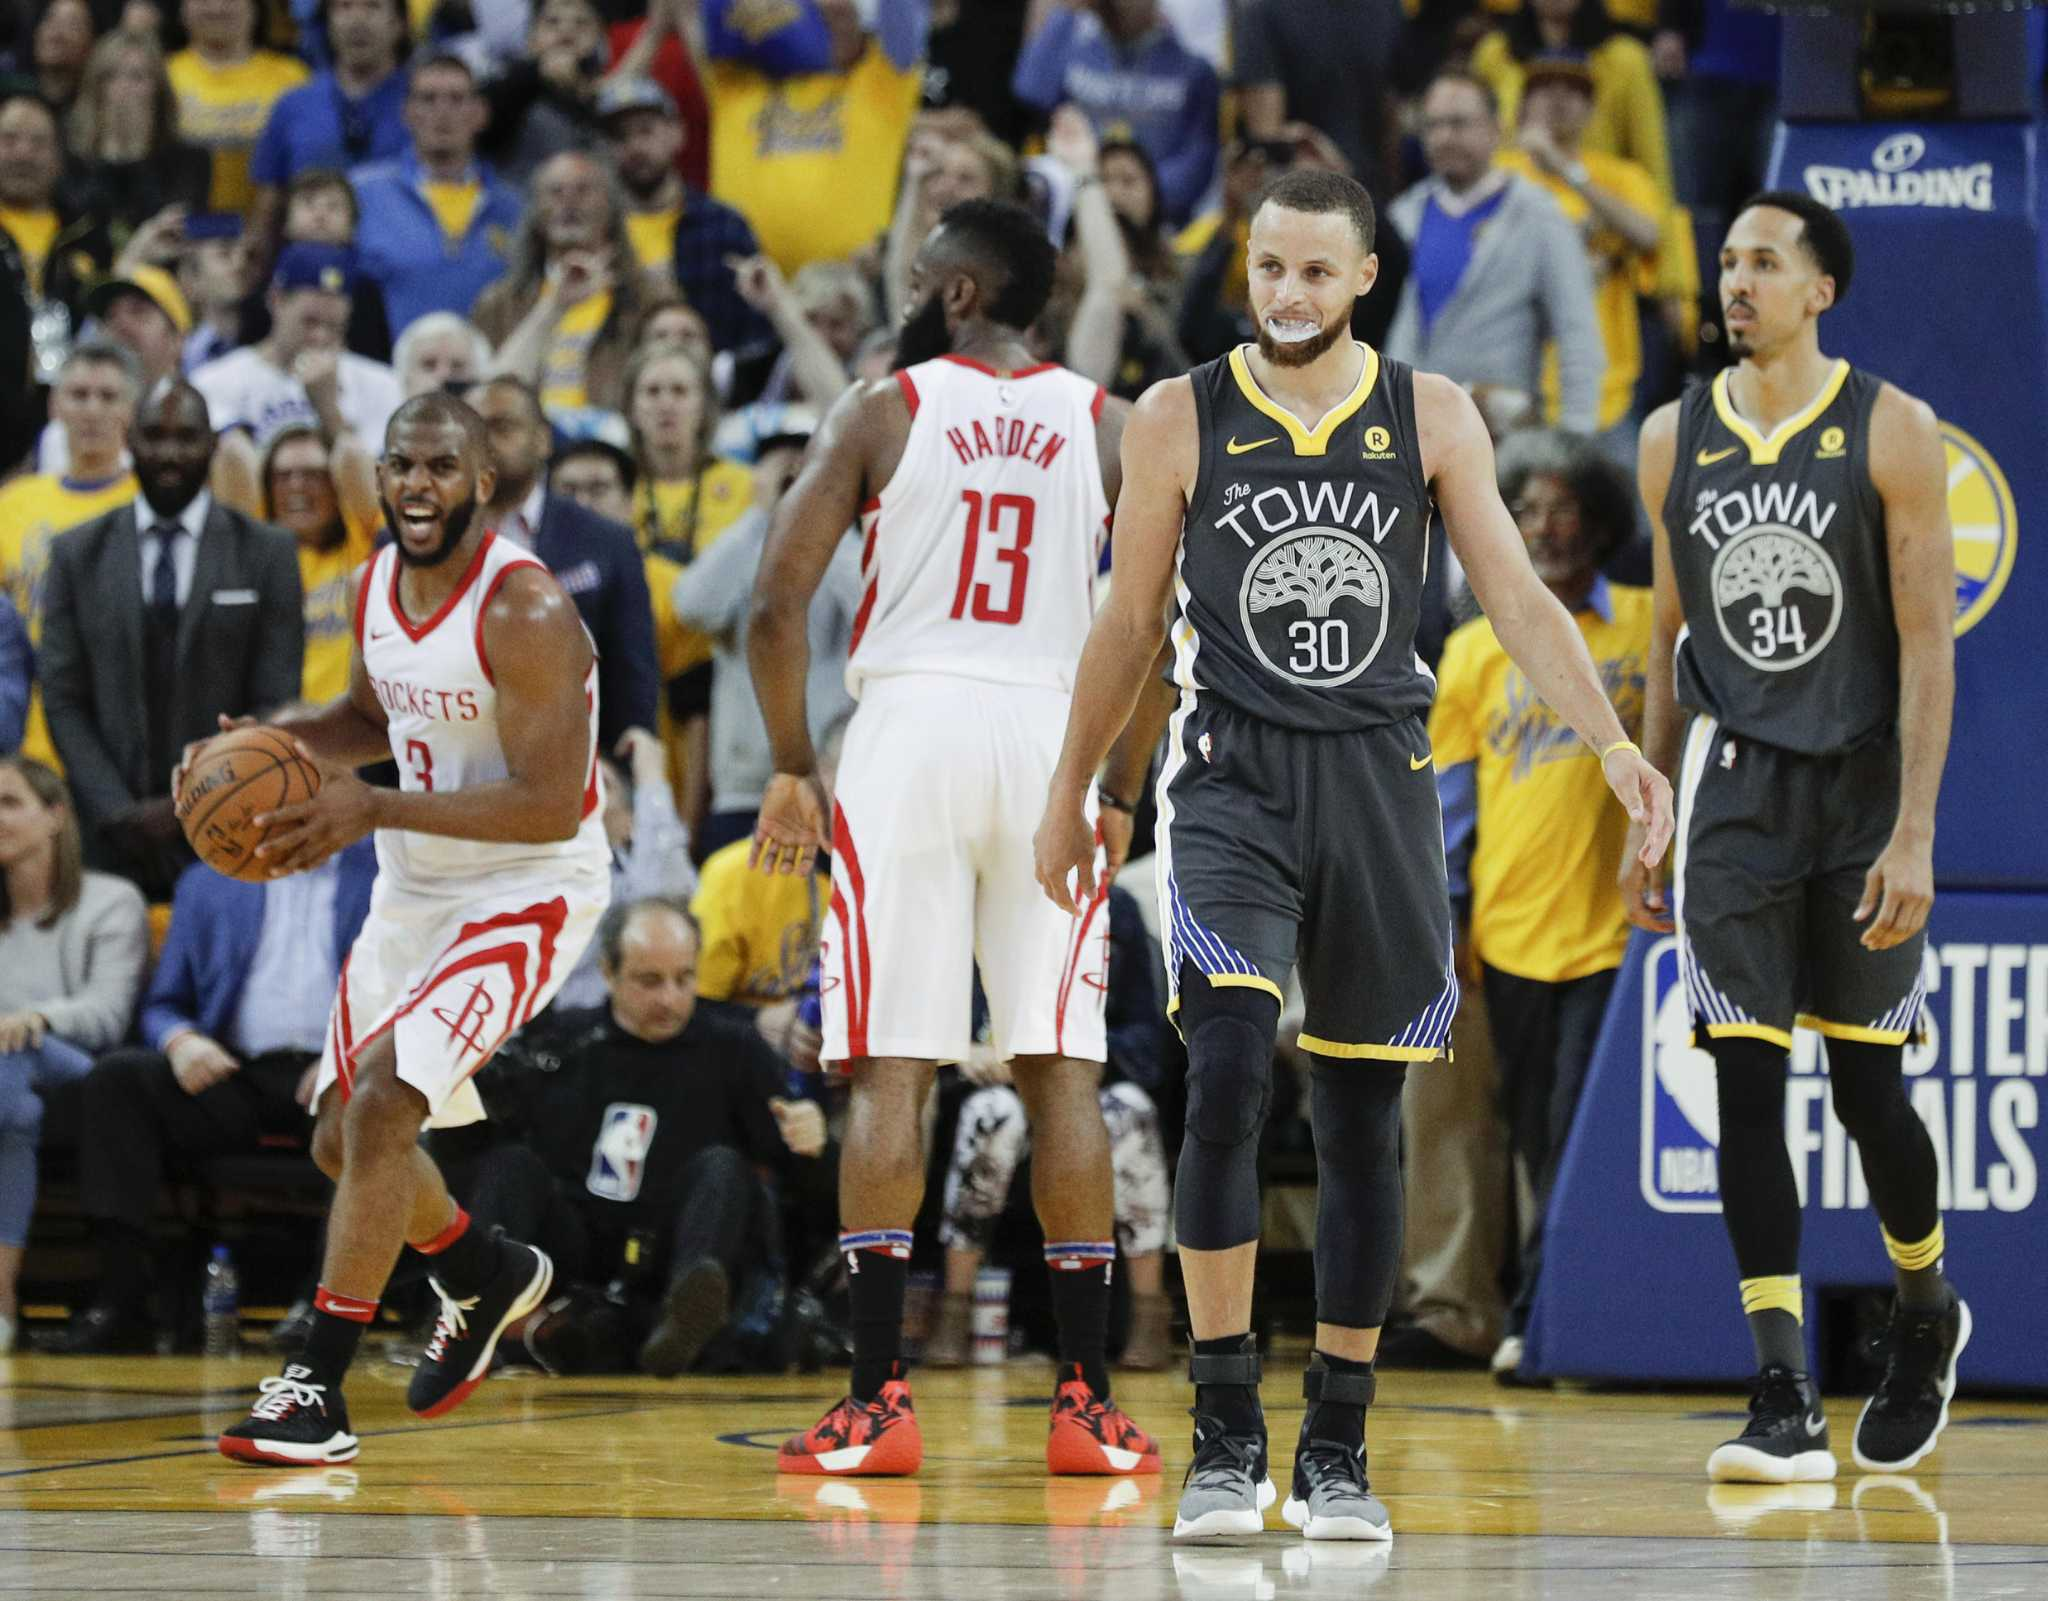 5272abfee9e Warriors  Kerr feels bad that Rockets  Paul will miss Game 6 - SFGate